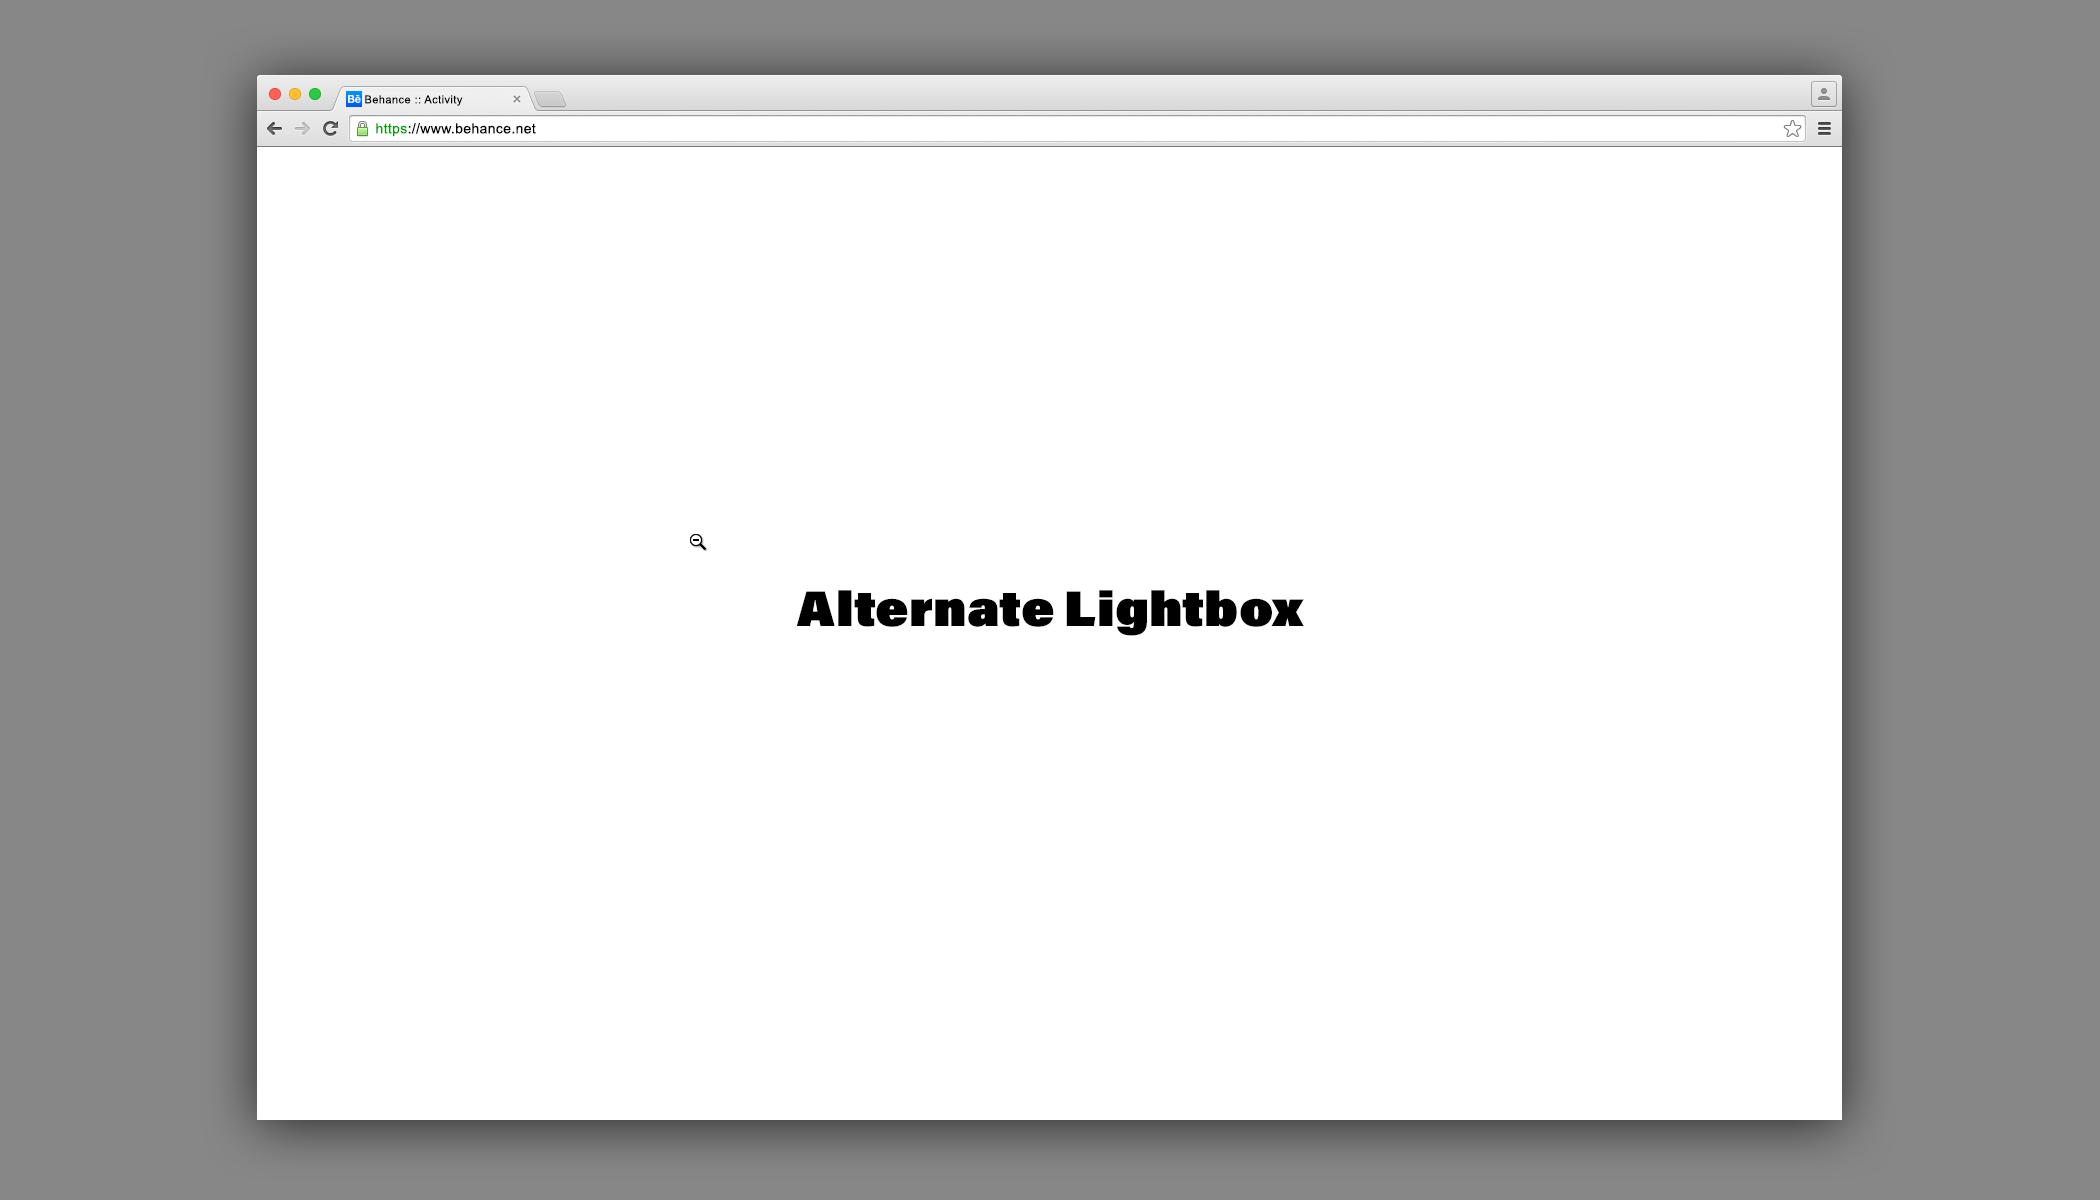 Net5_Project_View-Exploration_Jeannie_0044_ALTERNATE-LIGHTBOX.png